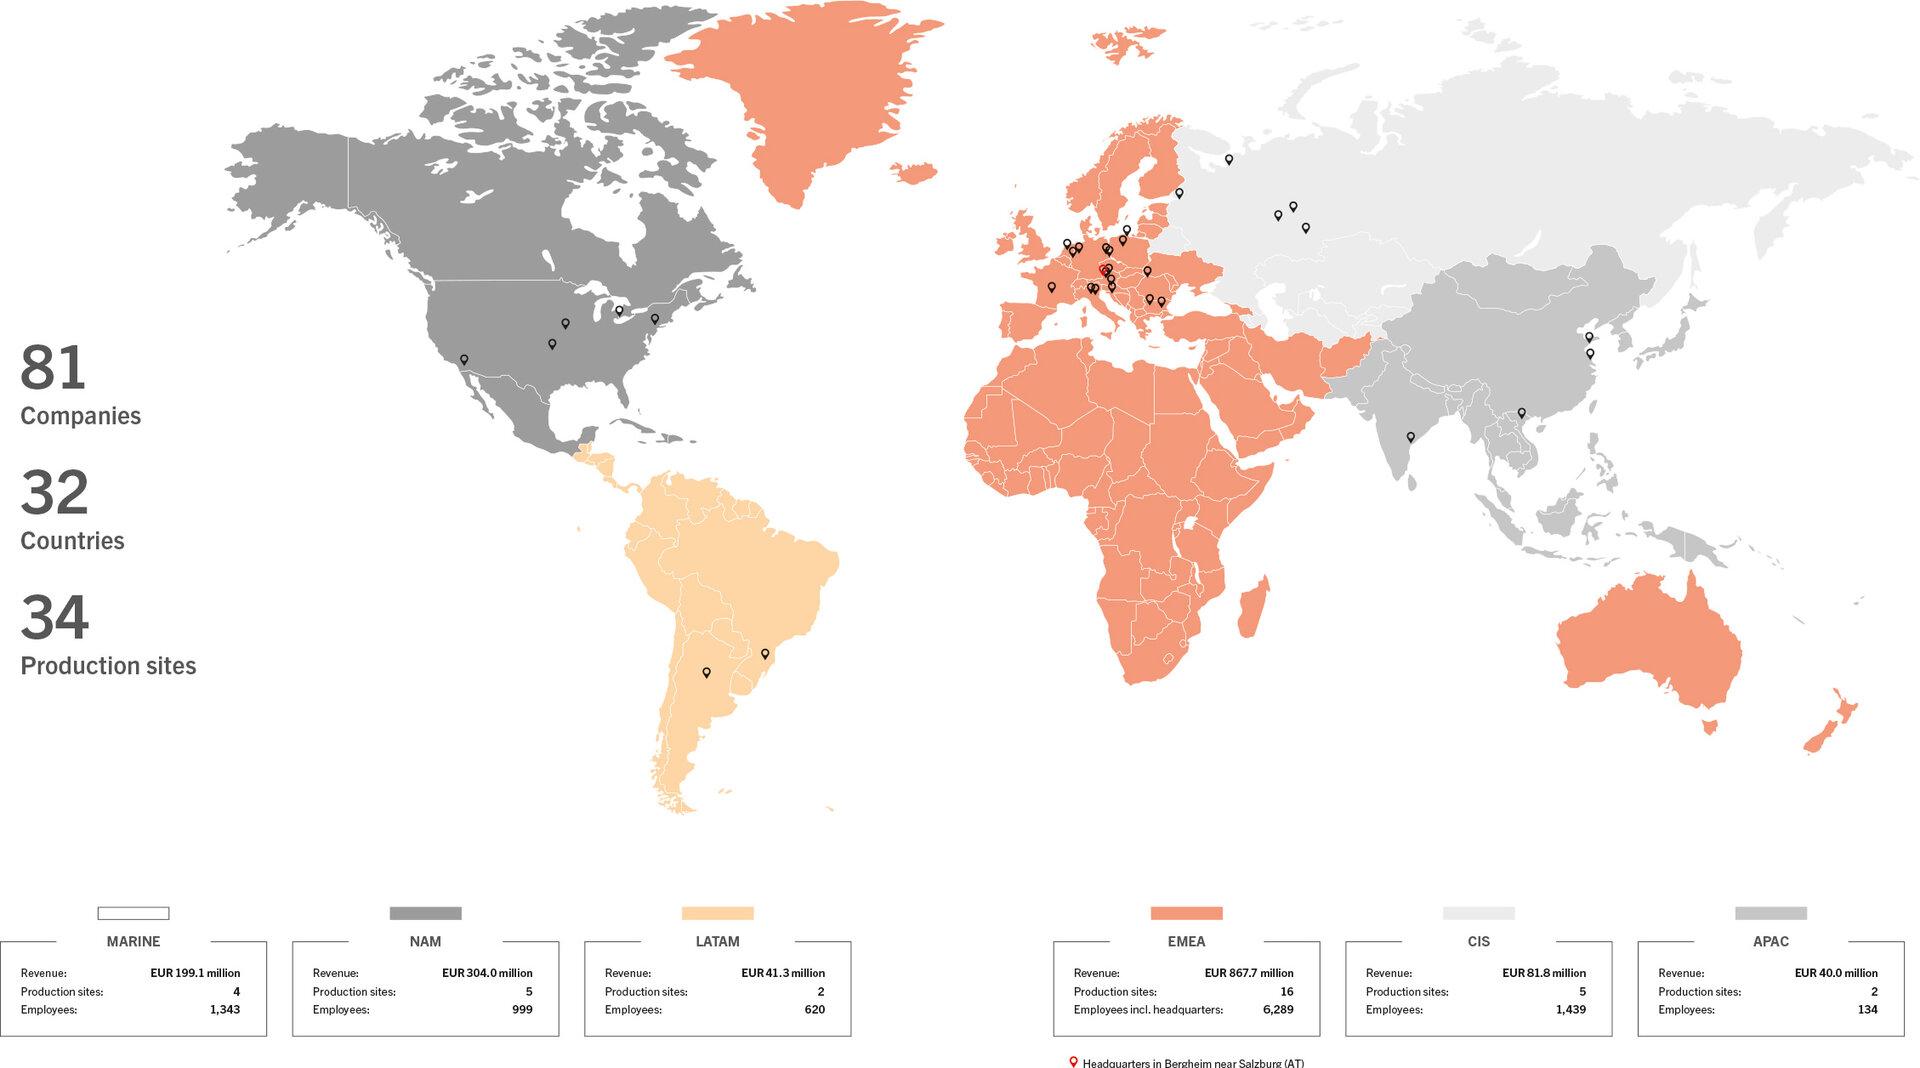 Production sites worldwide